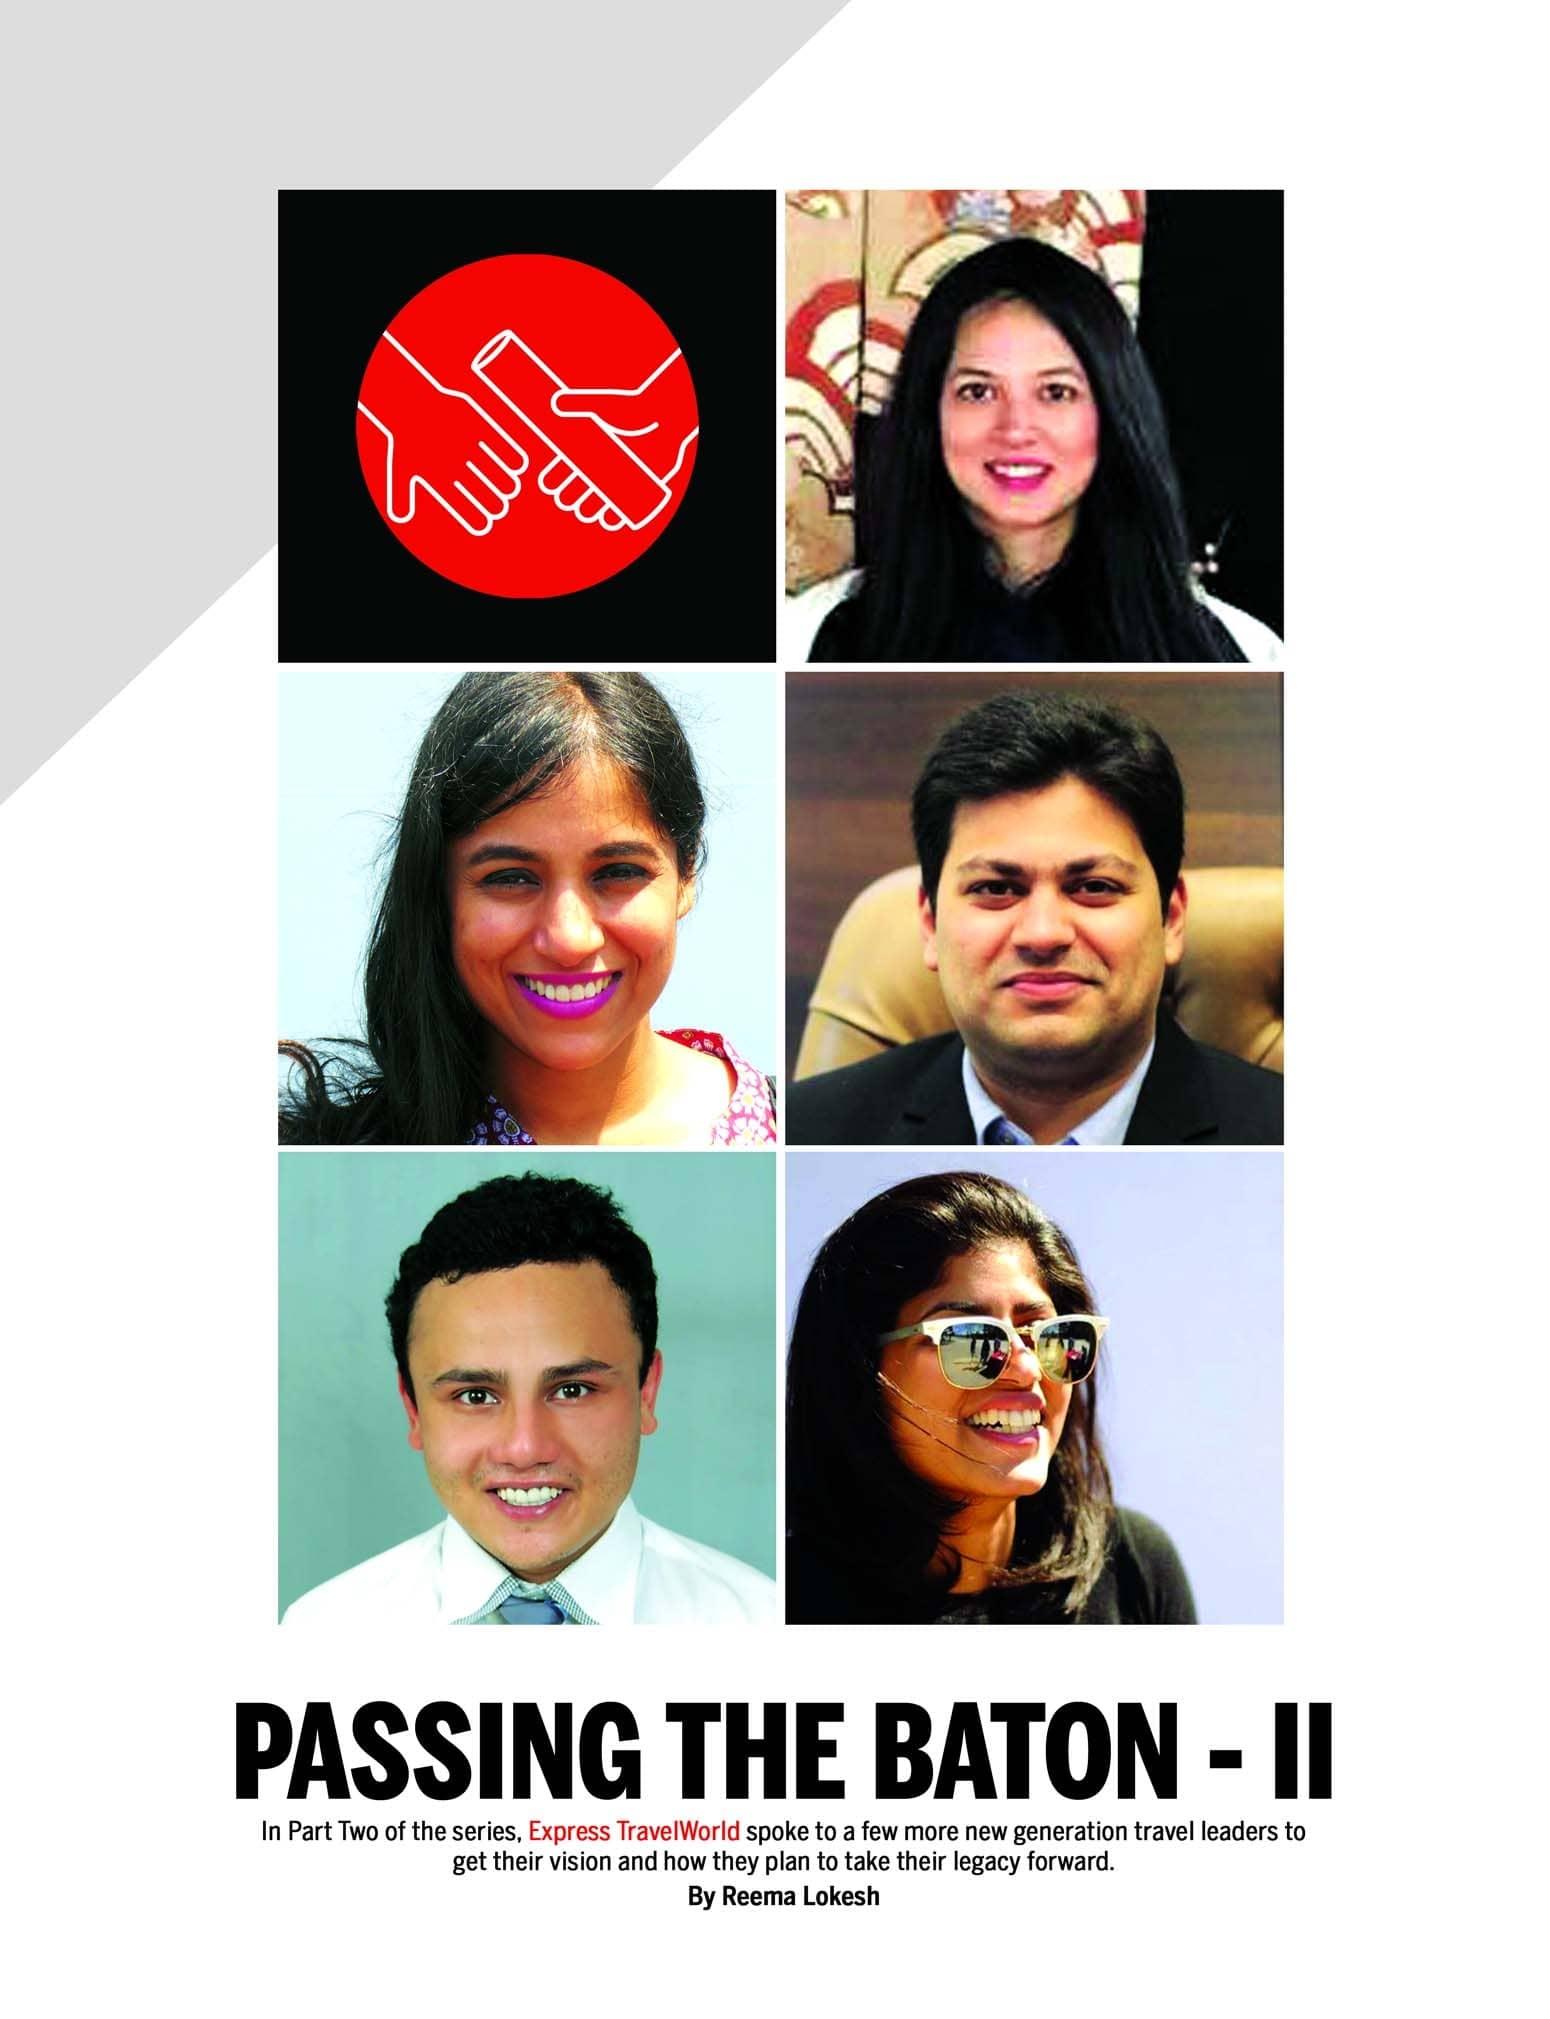 Passing The Baton - Ii